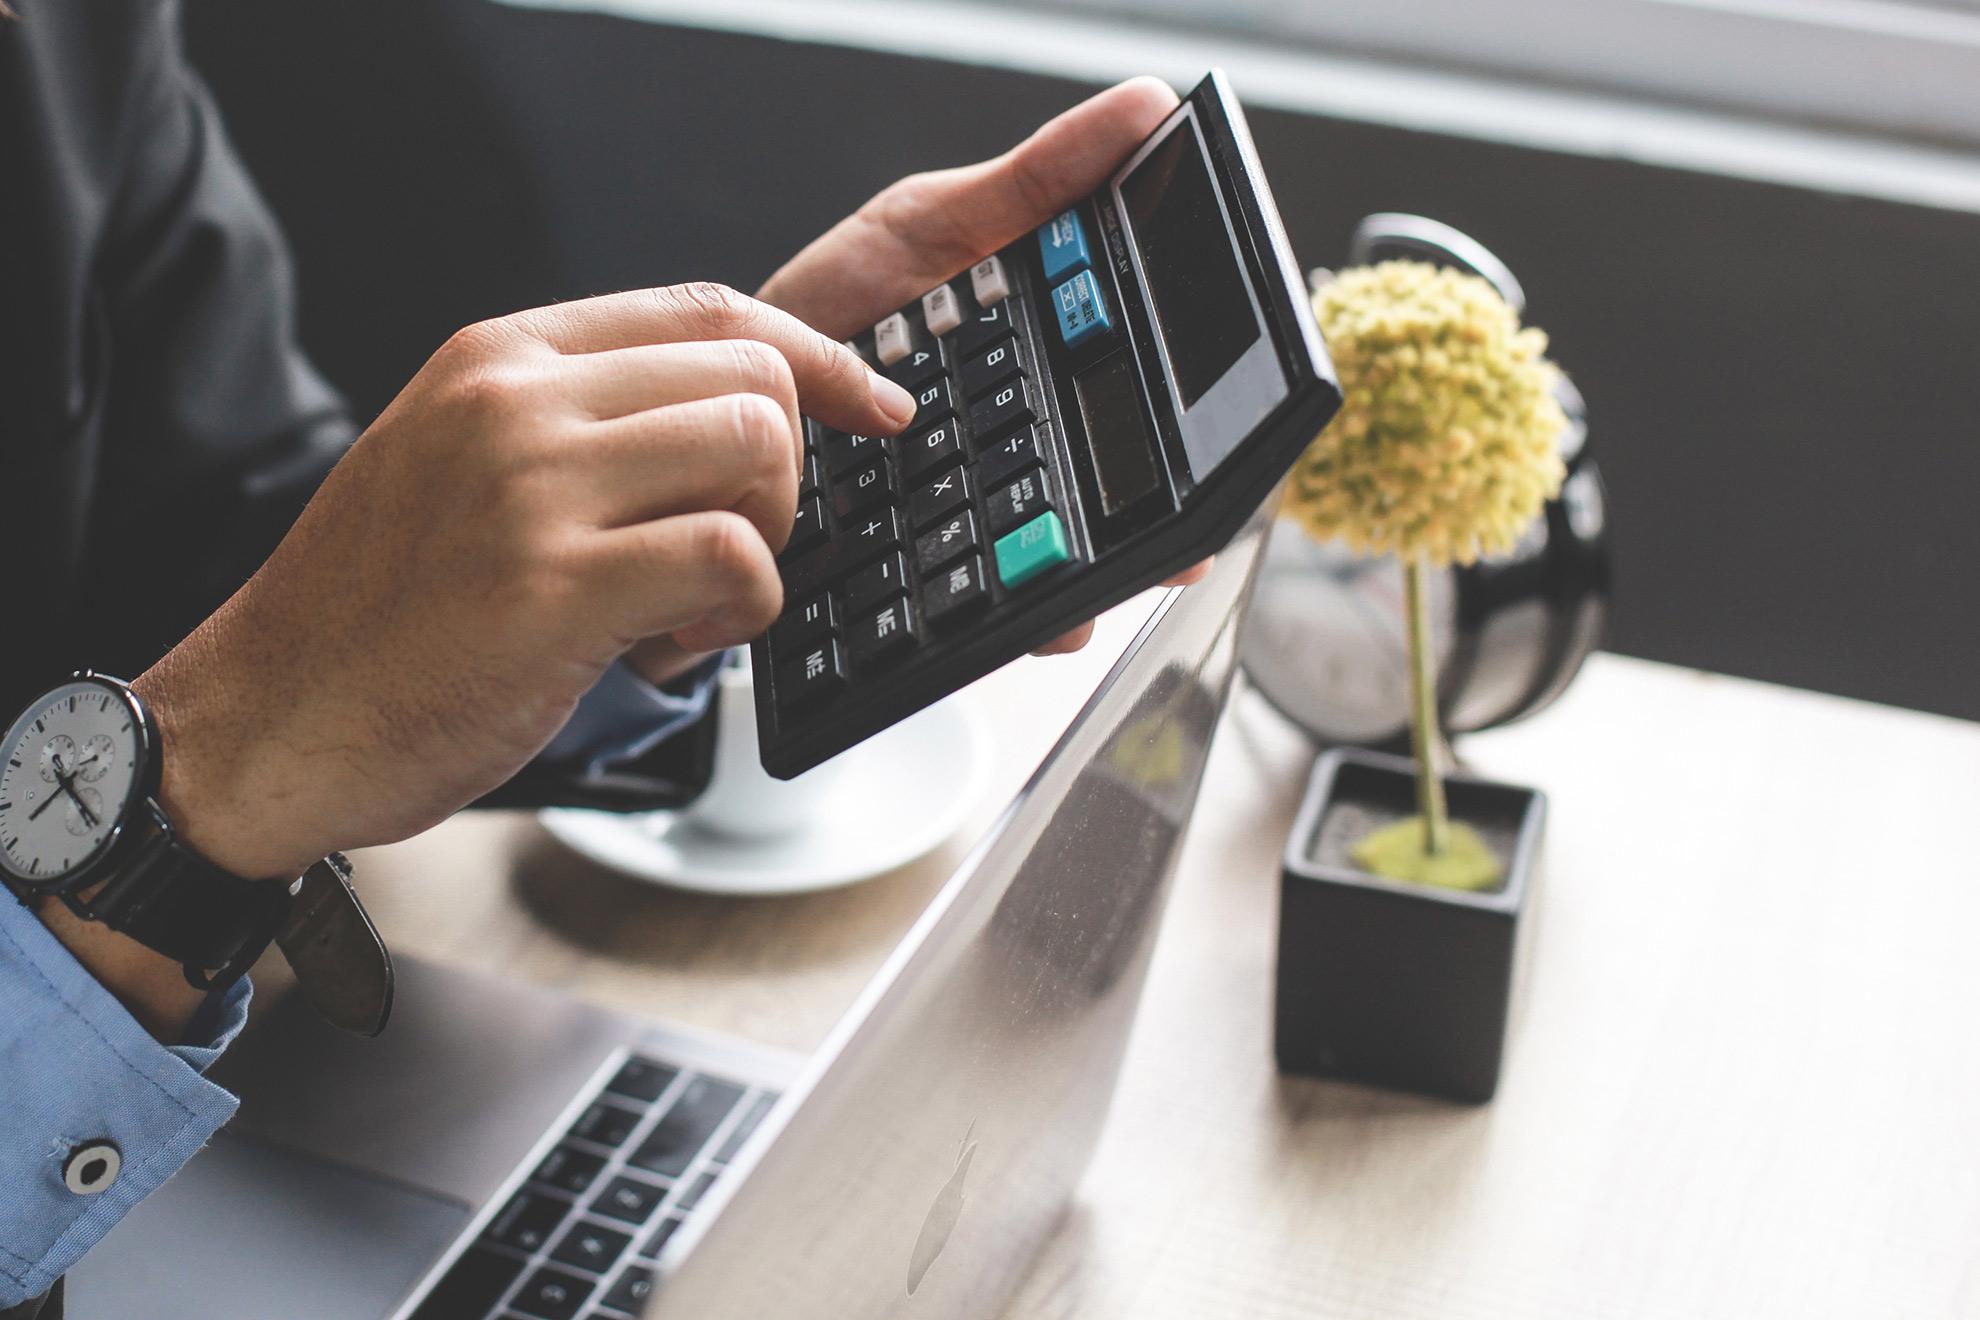 Kalkulator, ilustracja do artykułu